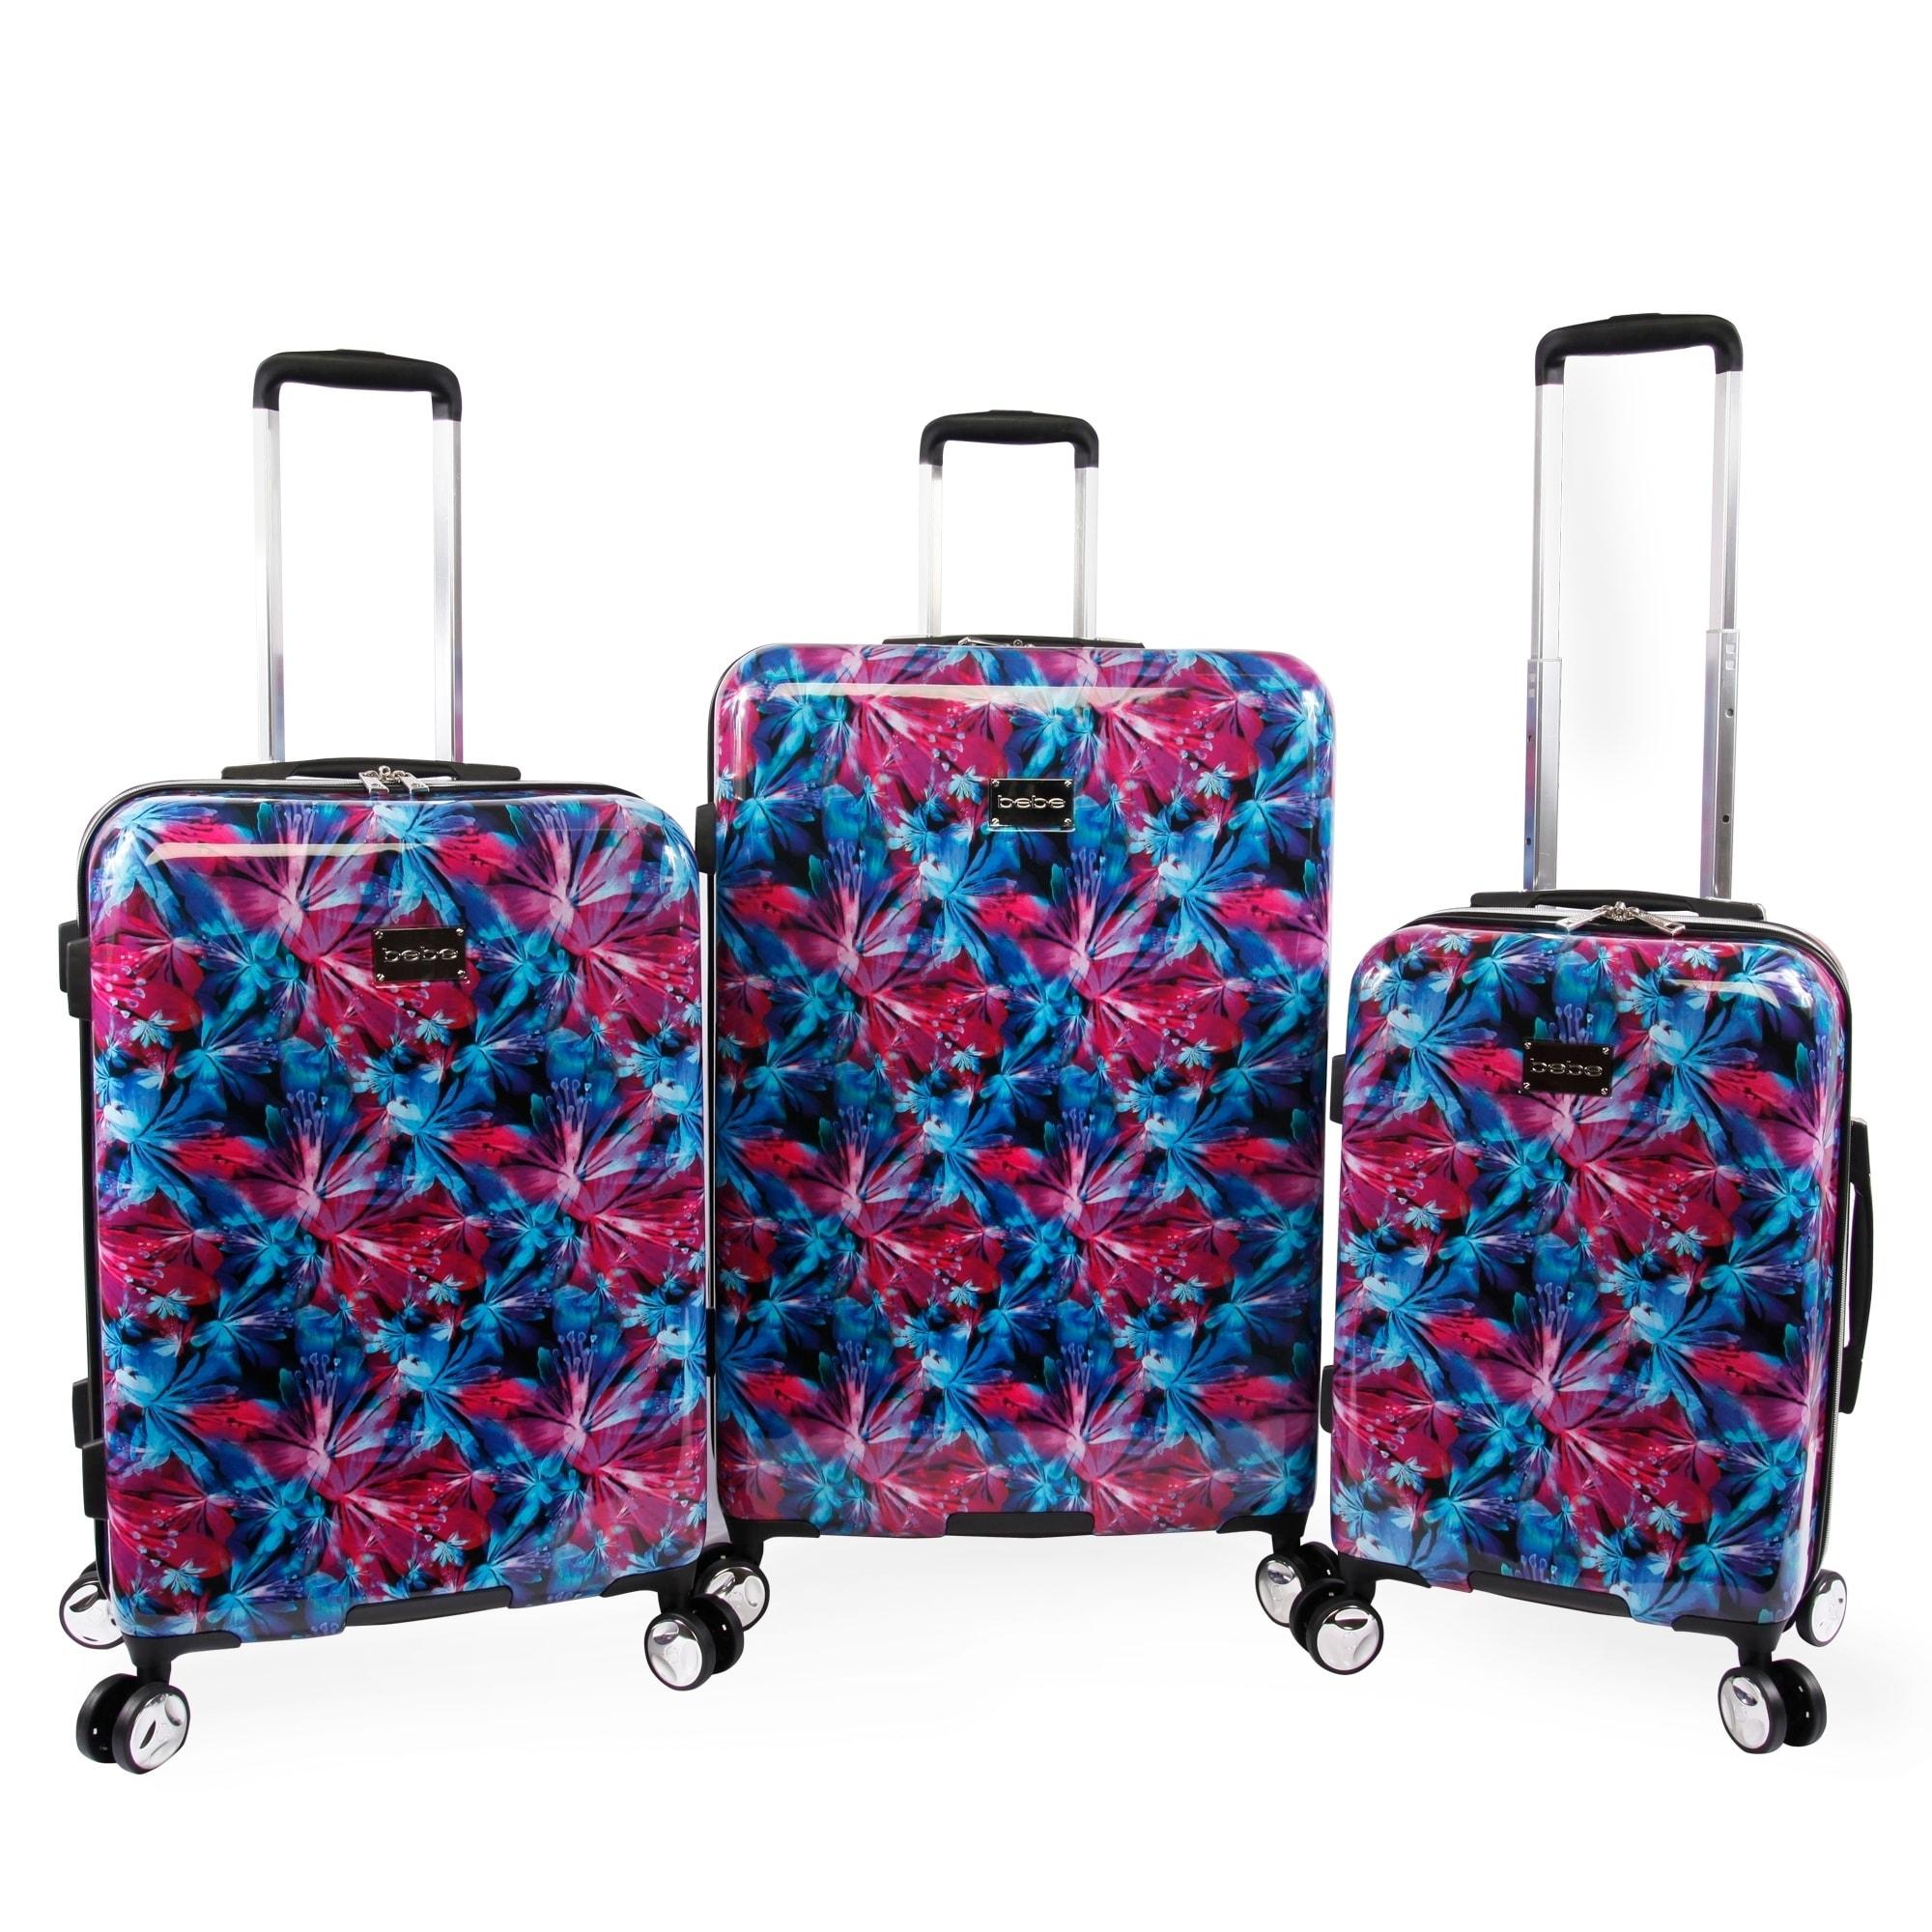 e1529393e01 Shop Bebe Tina 3-pc Hardside Spinner Luggage Set - Free Shipping Today -  Overstock - 24266126